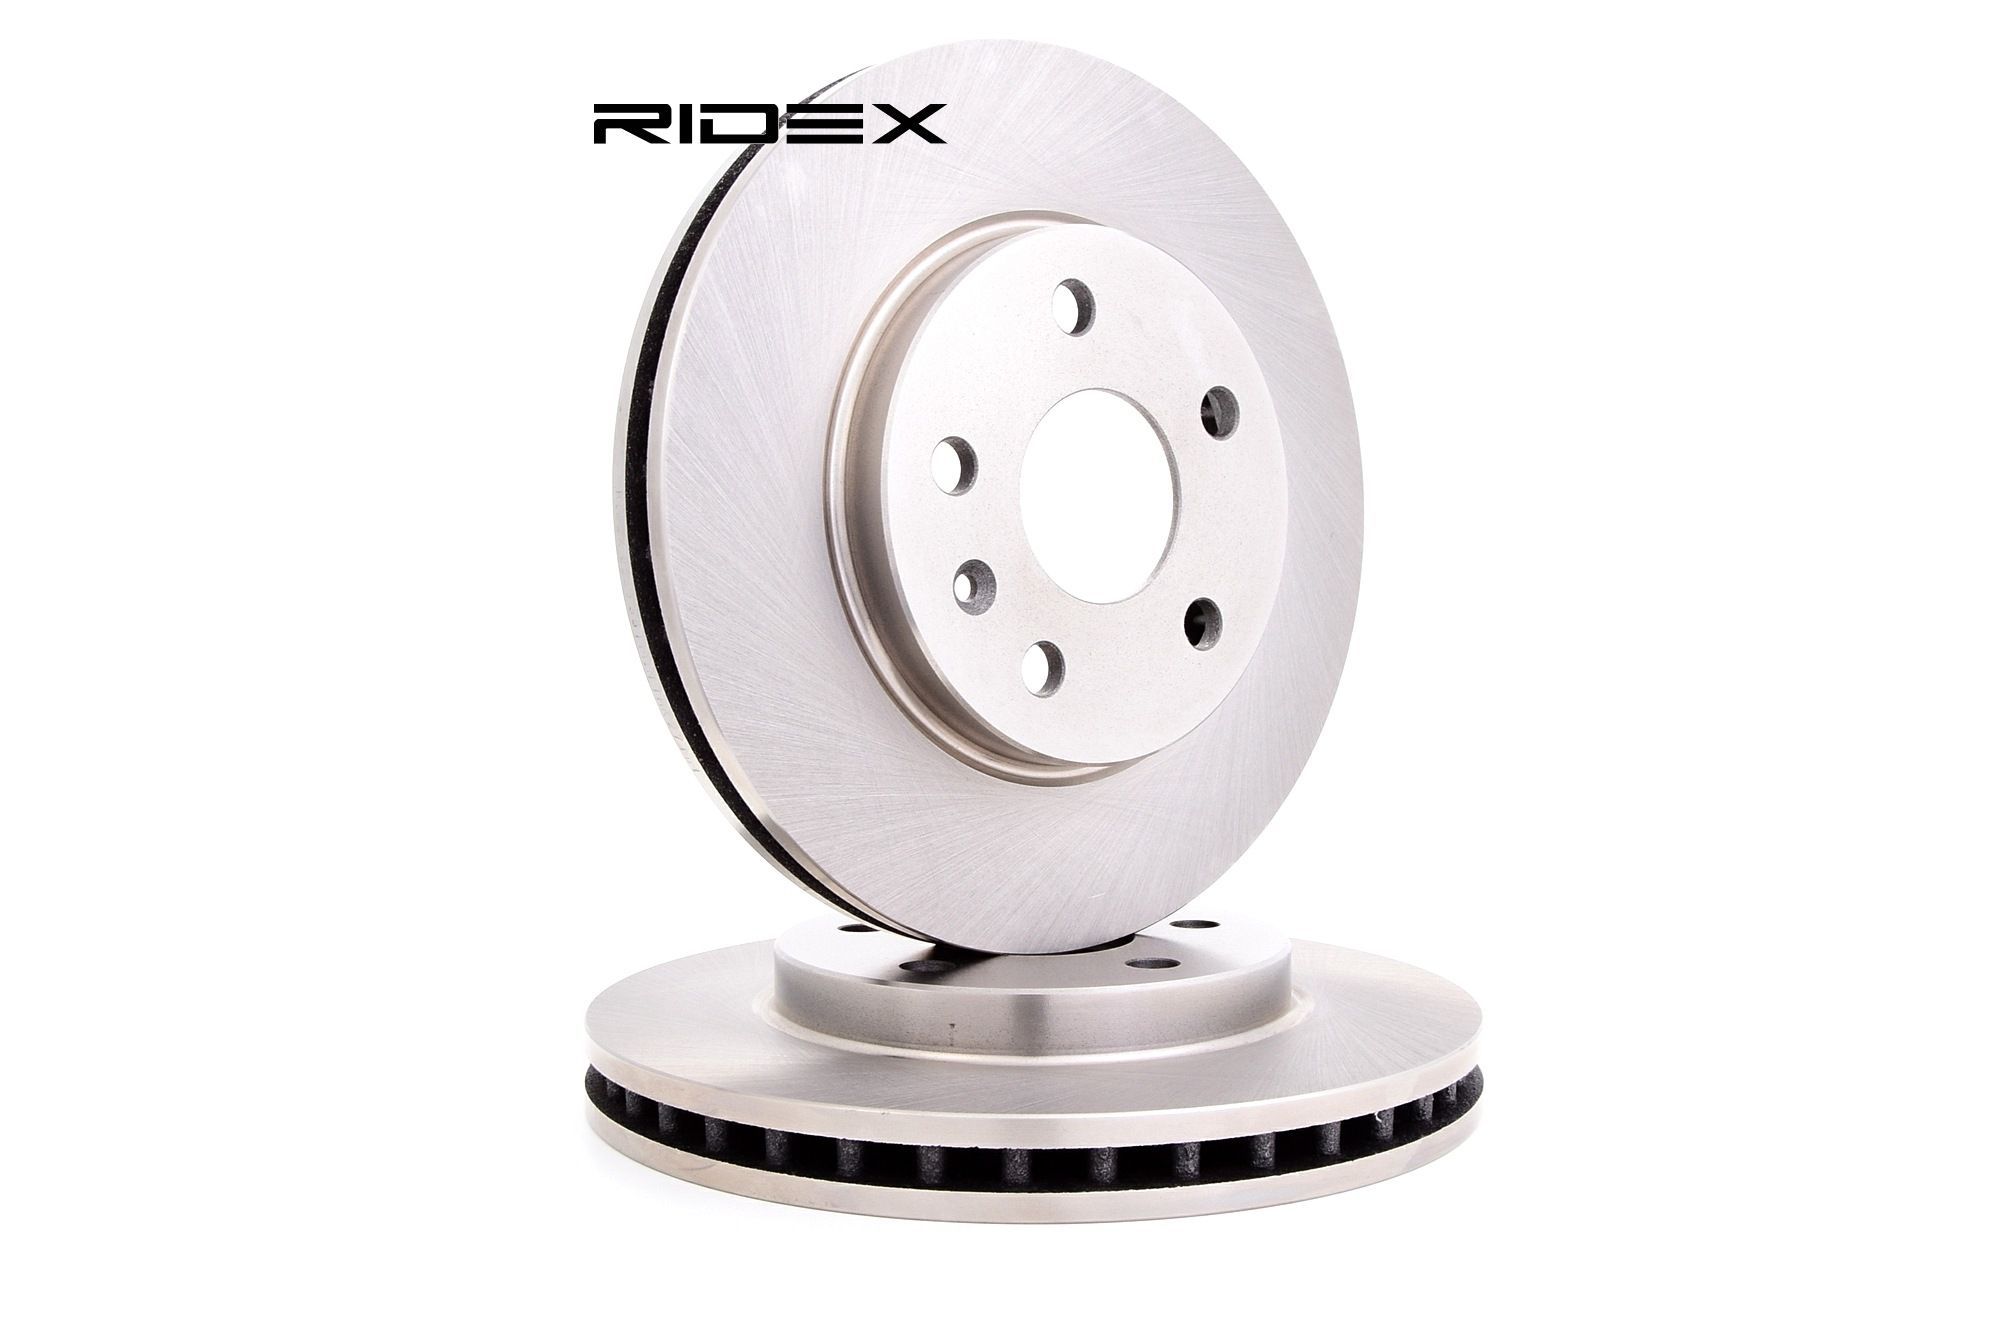 RIDEX: Original Tuning 82B0351 (Ø: 296,0mm, Felge: 5-loch, Bremsscheibendicke: 30mm)